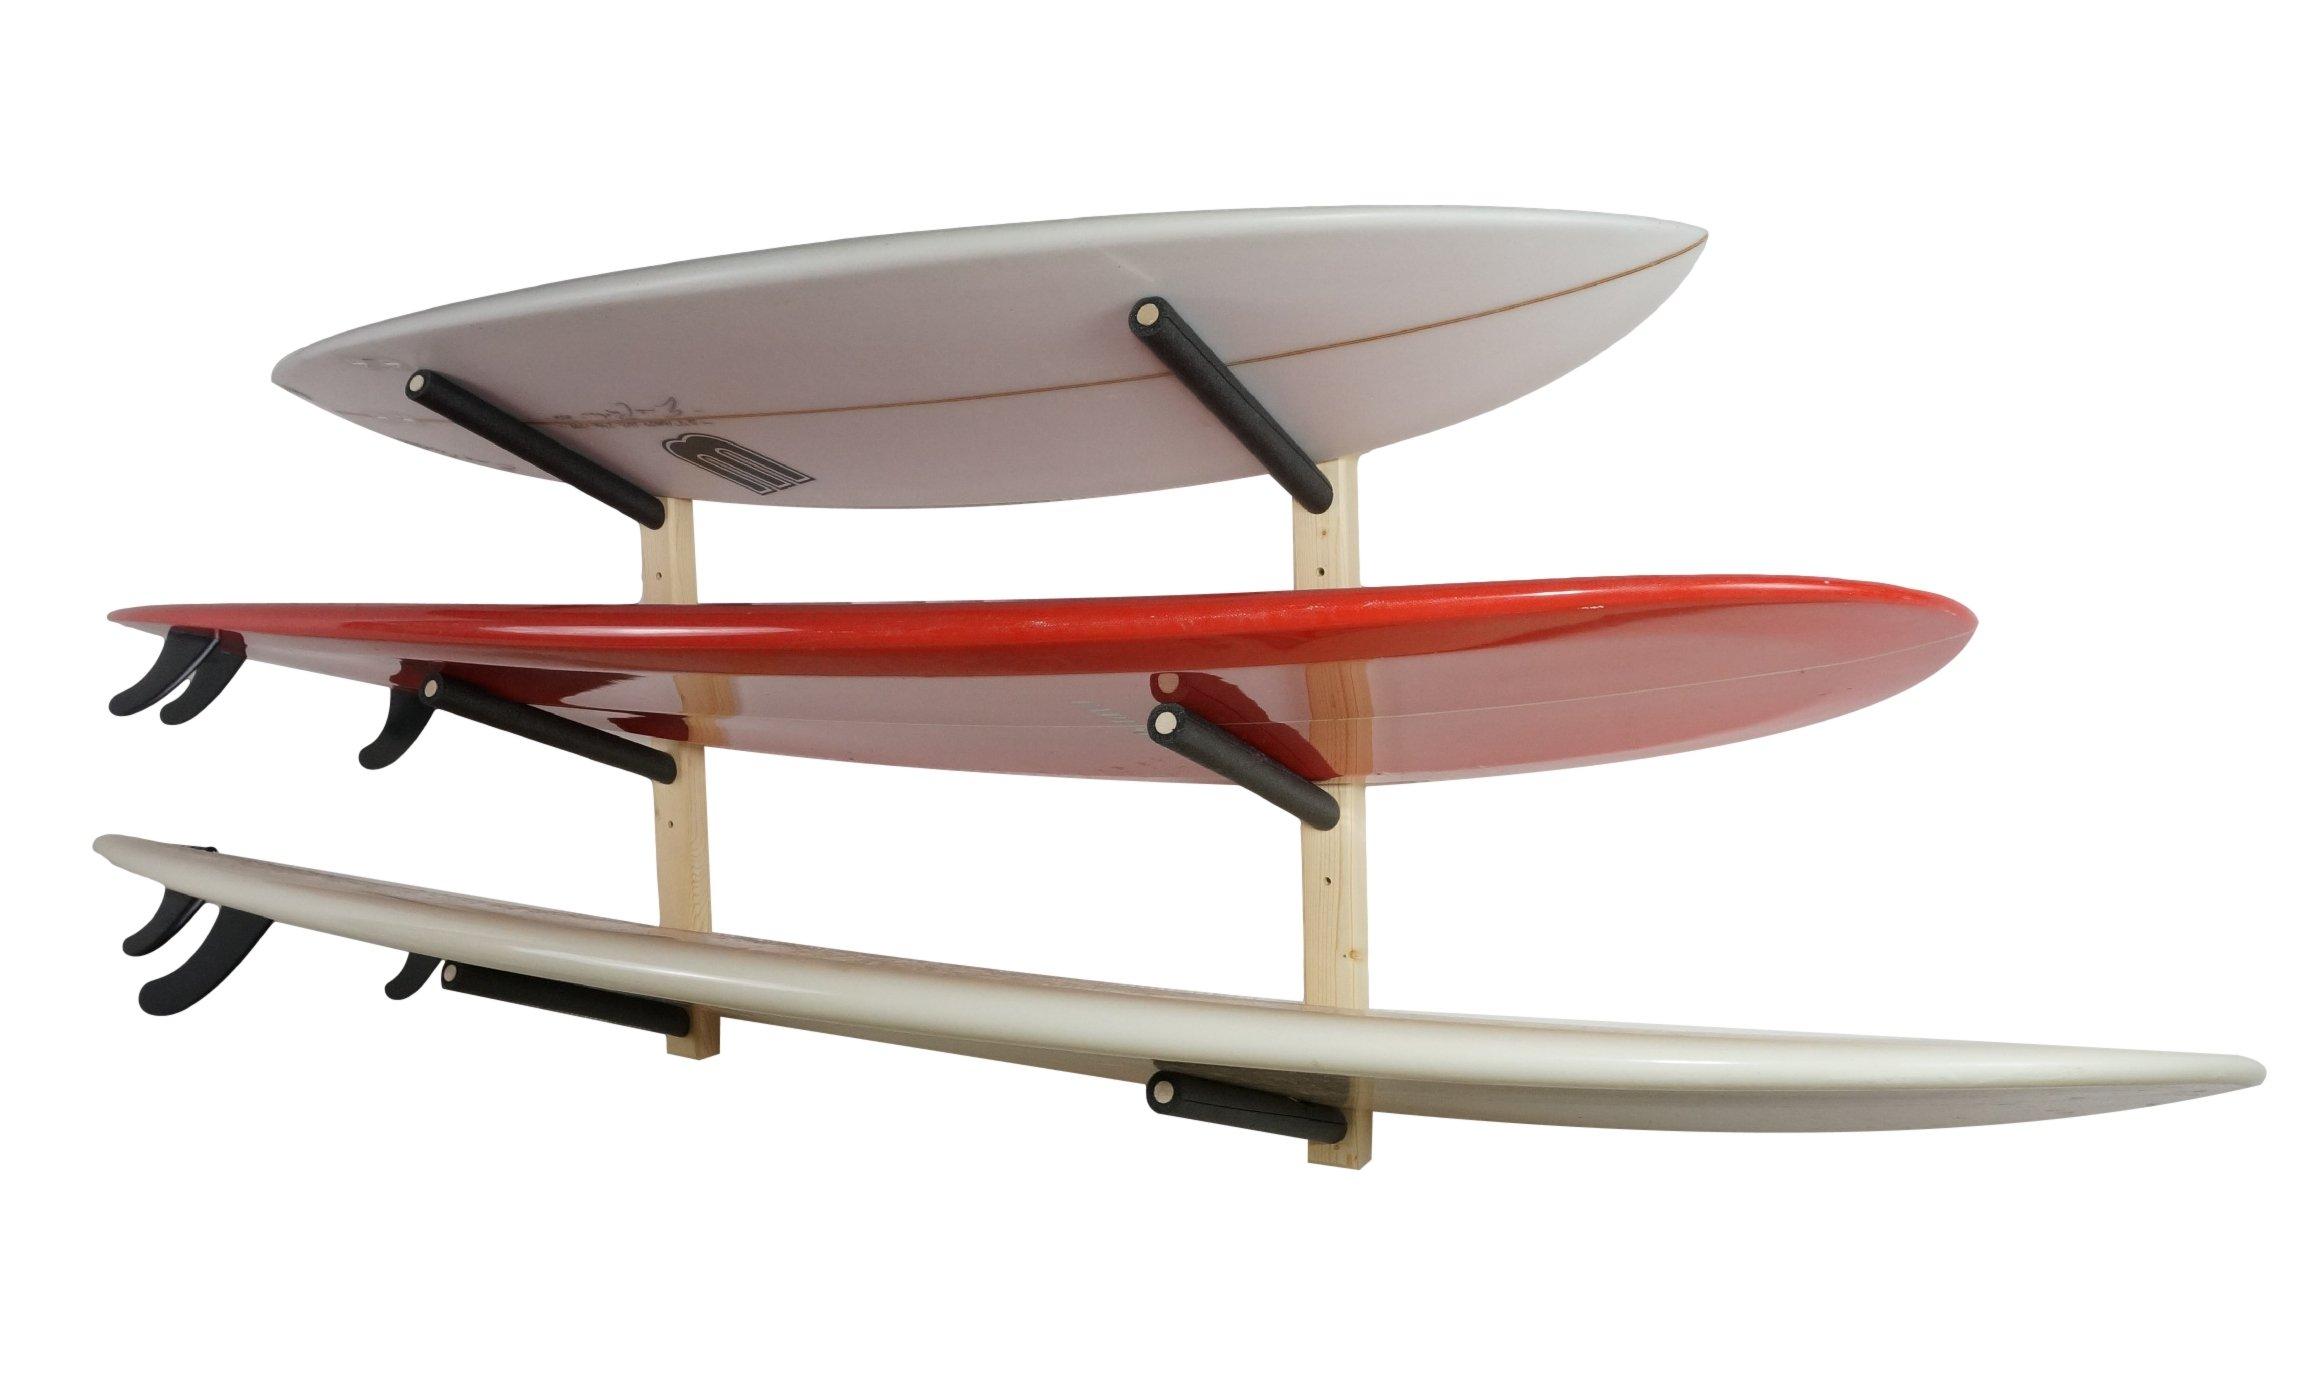 StoreYourBoard Surfboard Wall Rack, Wooden Surf Storage Rack for 3 Boards